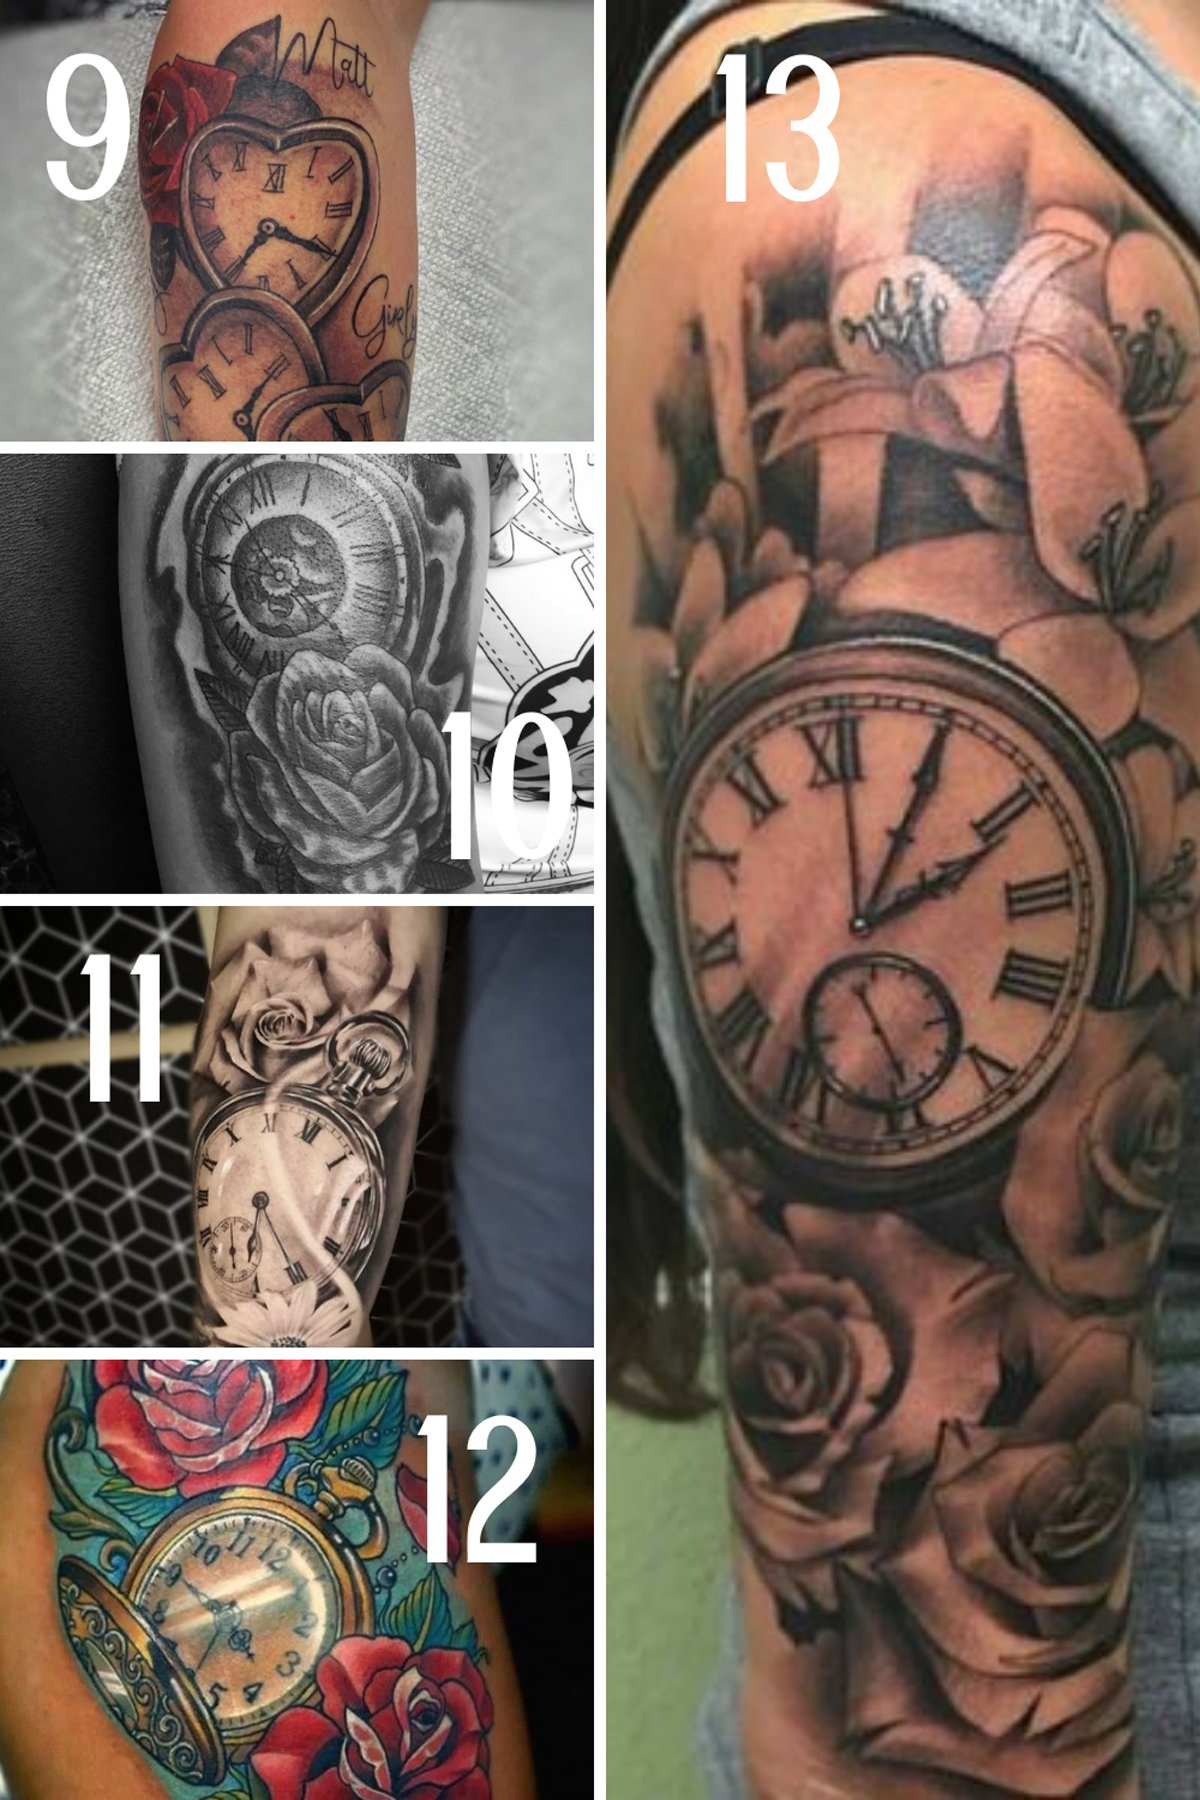 Shoulder Clock and Flower Tattoos